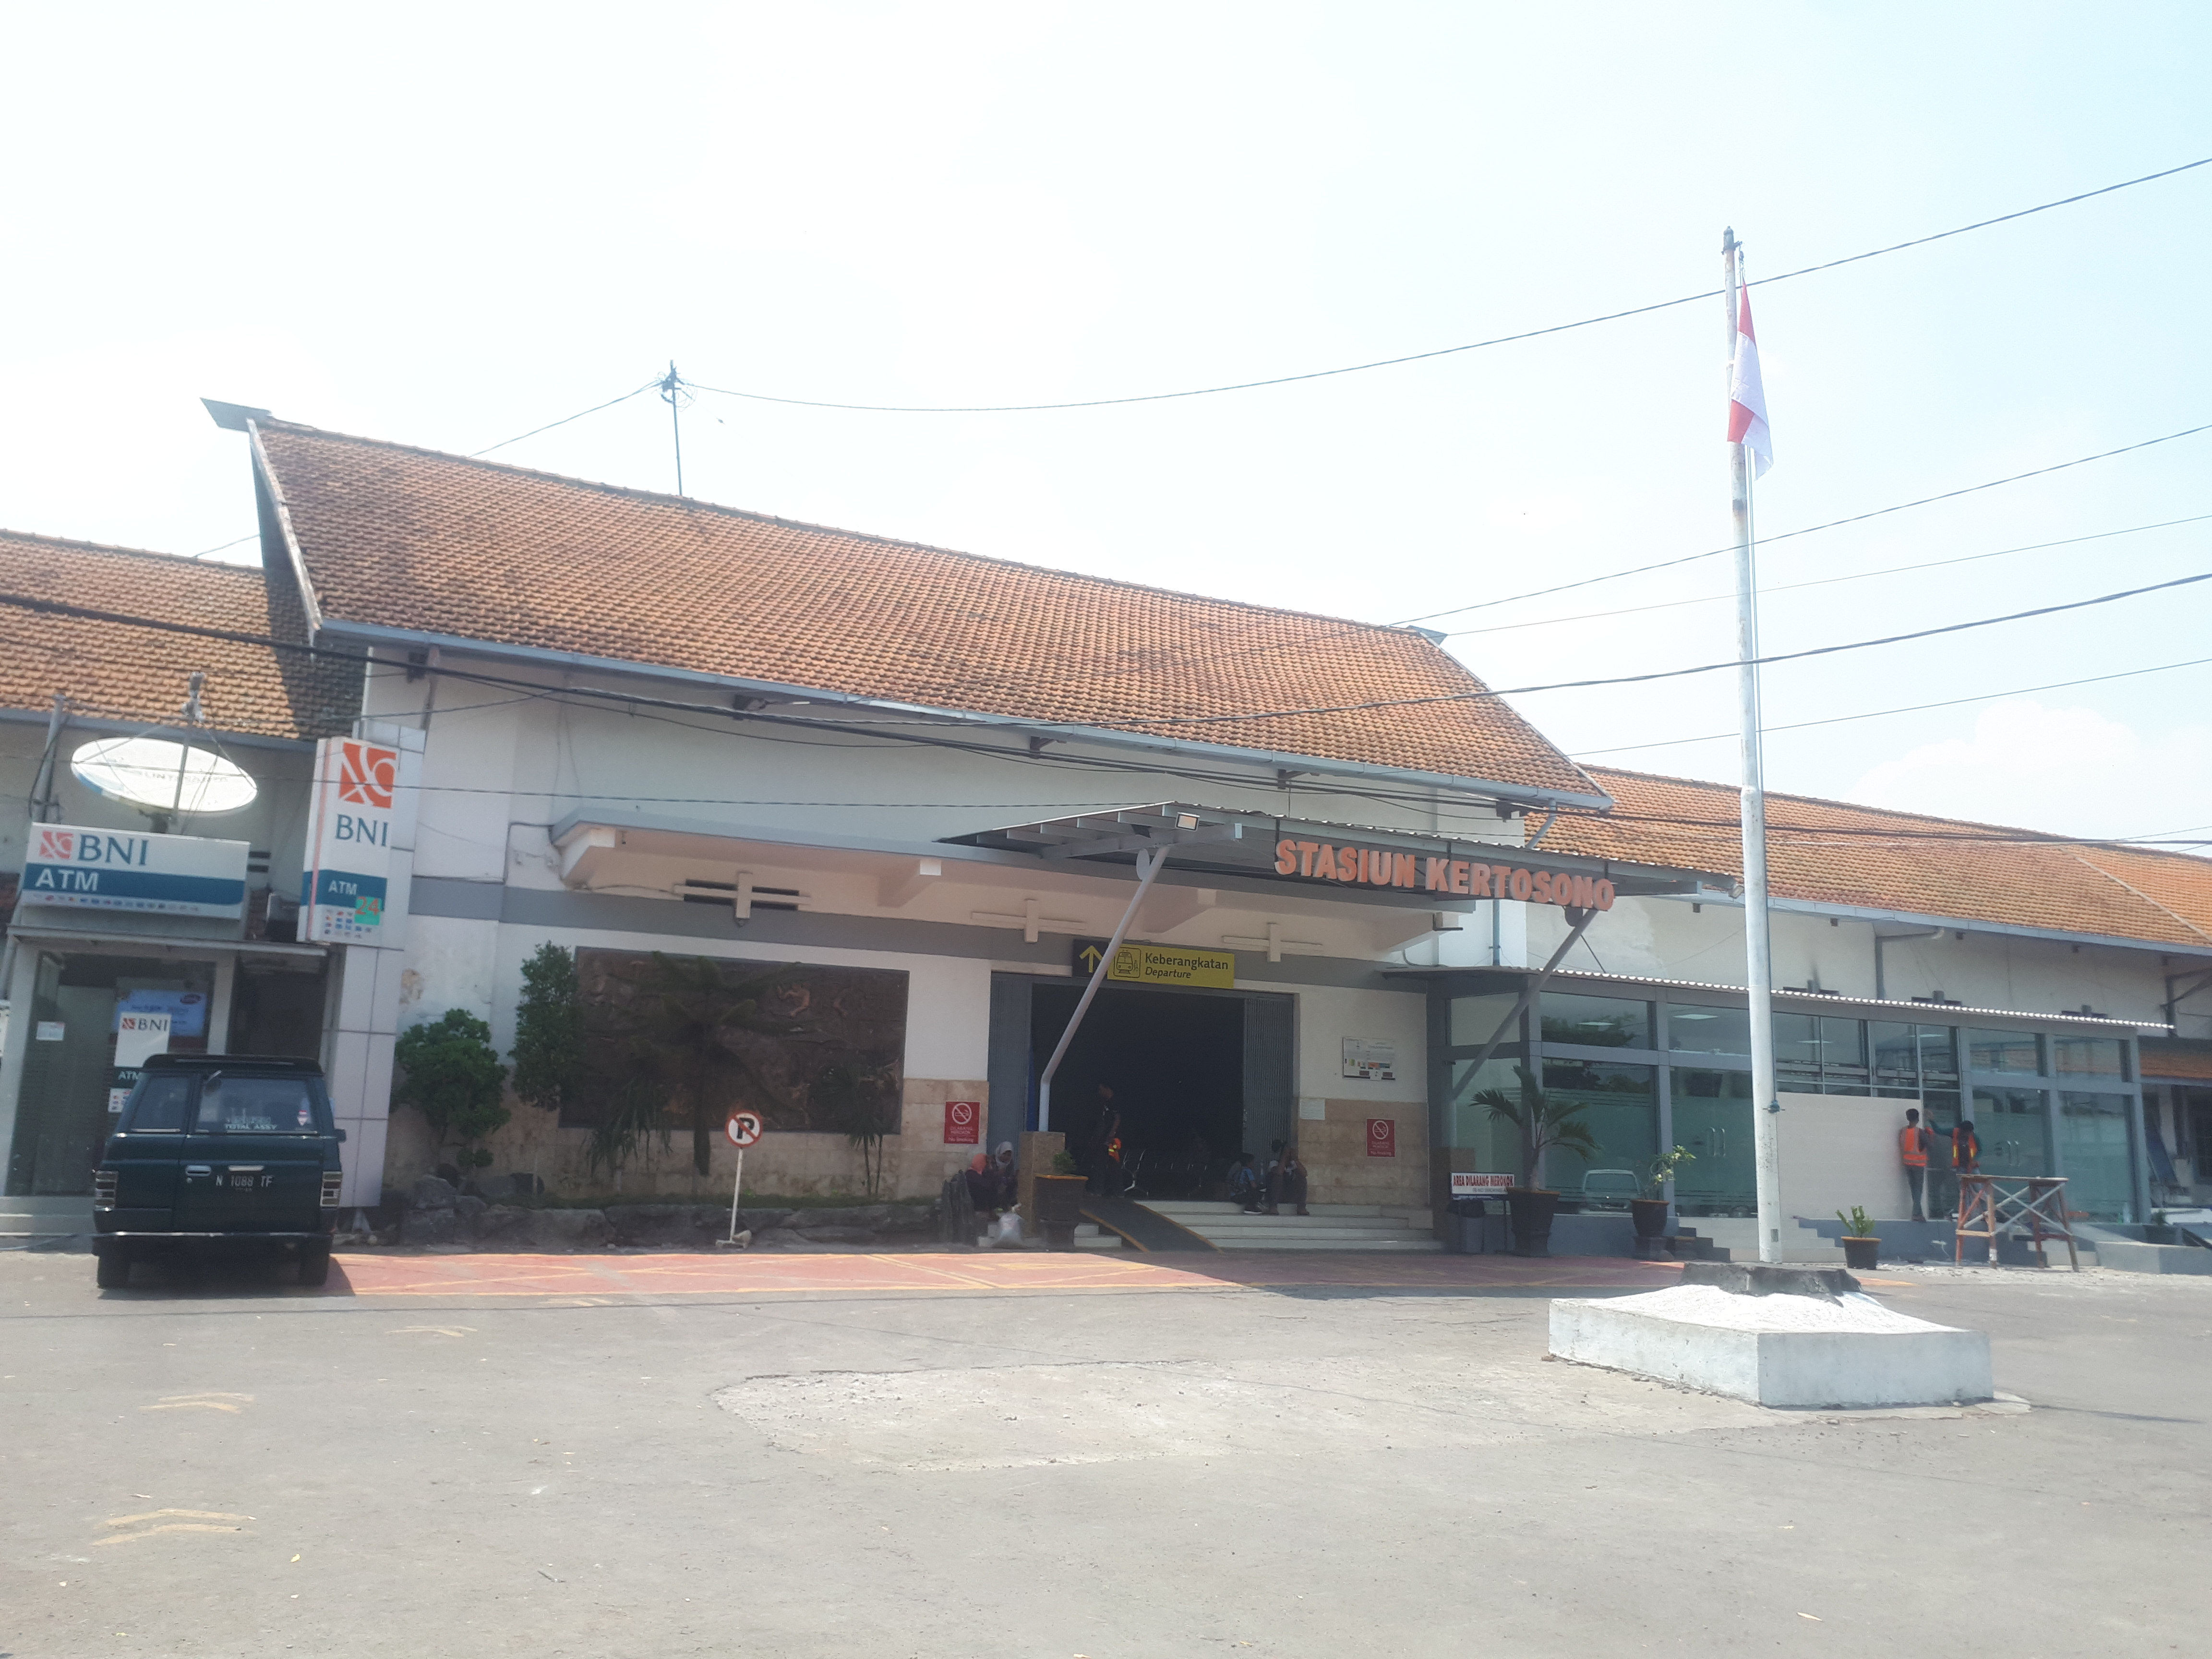 Met Parking Services >> Stasiun Kertosono Wikipedia Bahasa Indonesia Ensiklopedia